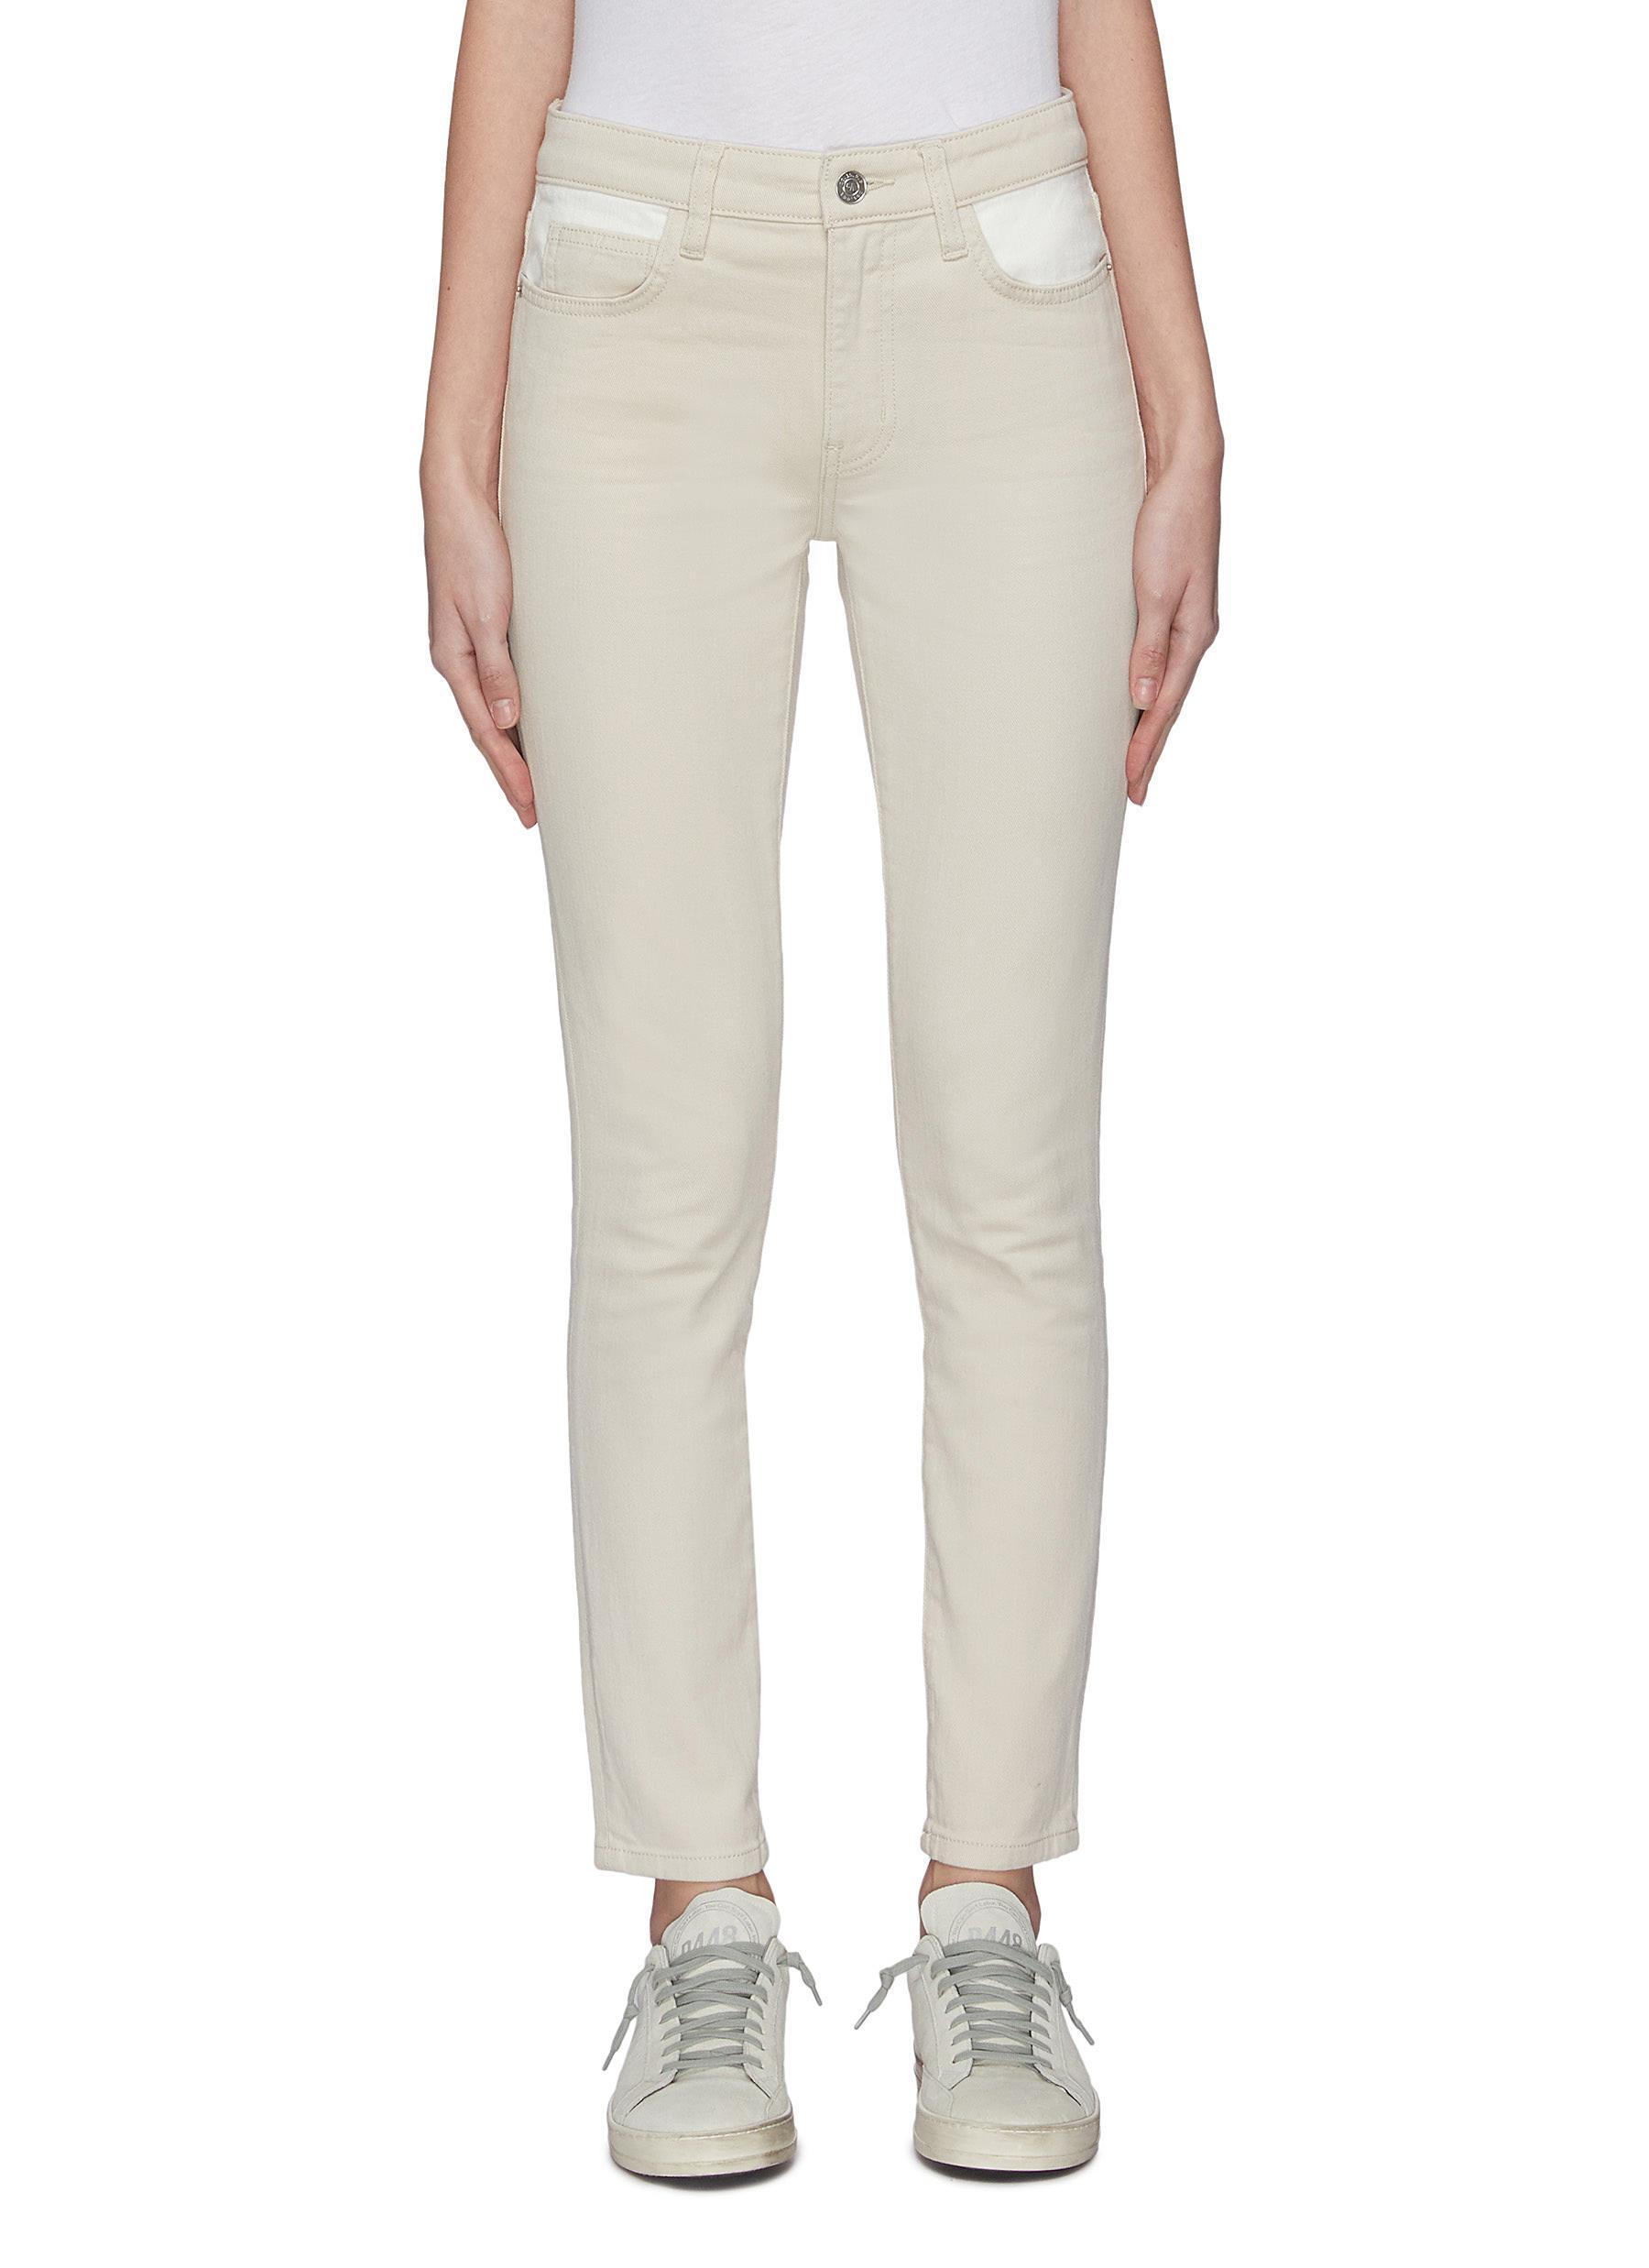 Buy Current/Elliott Jeans 'The Original Stiletto' jeans